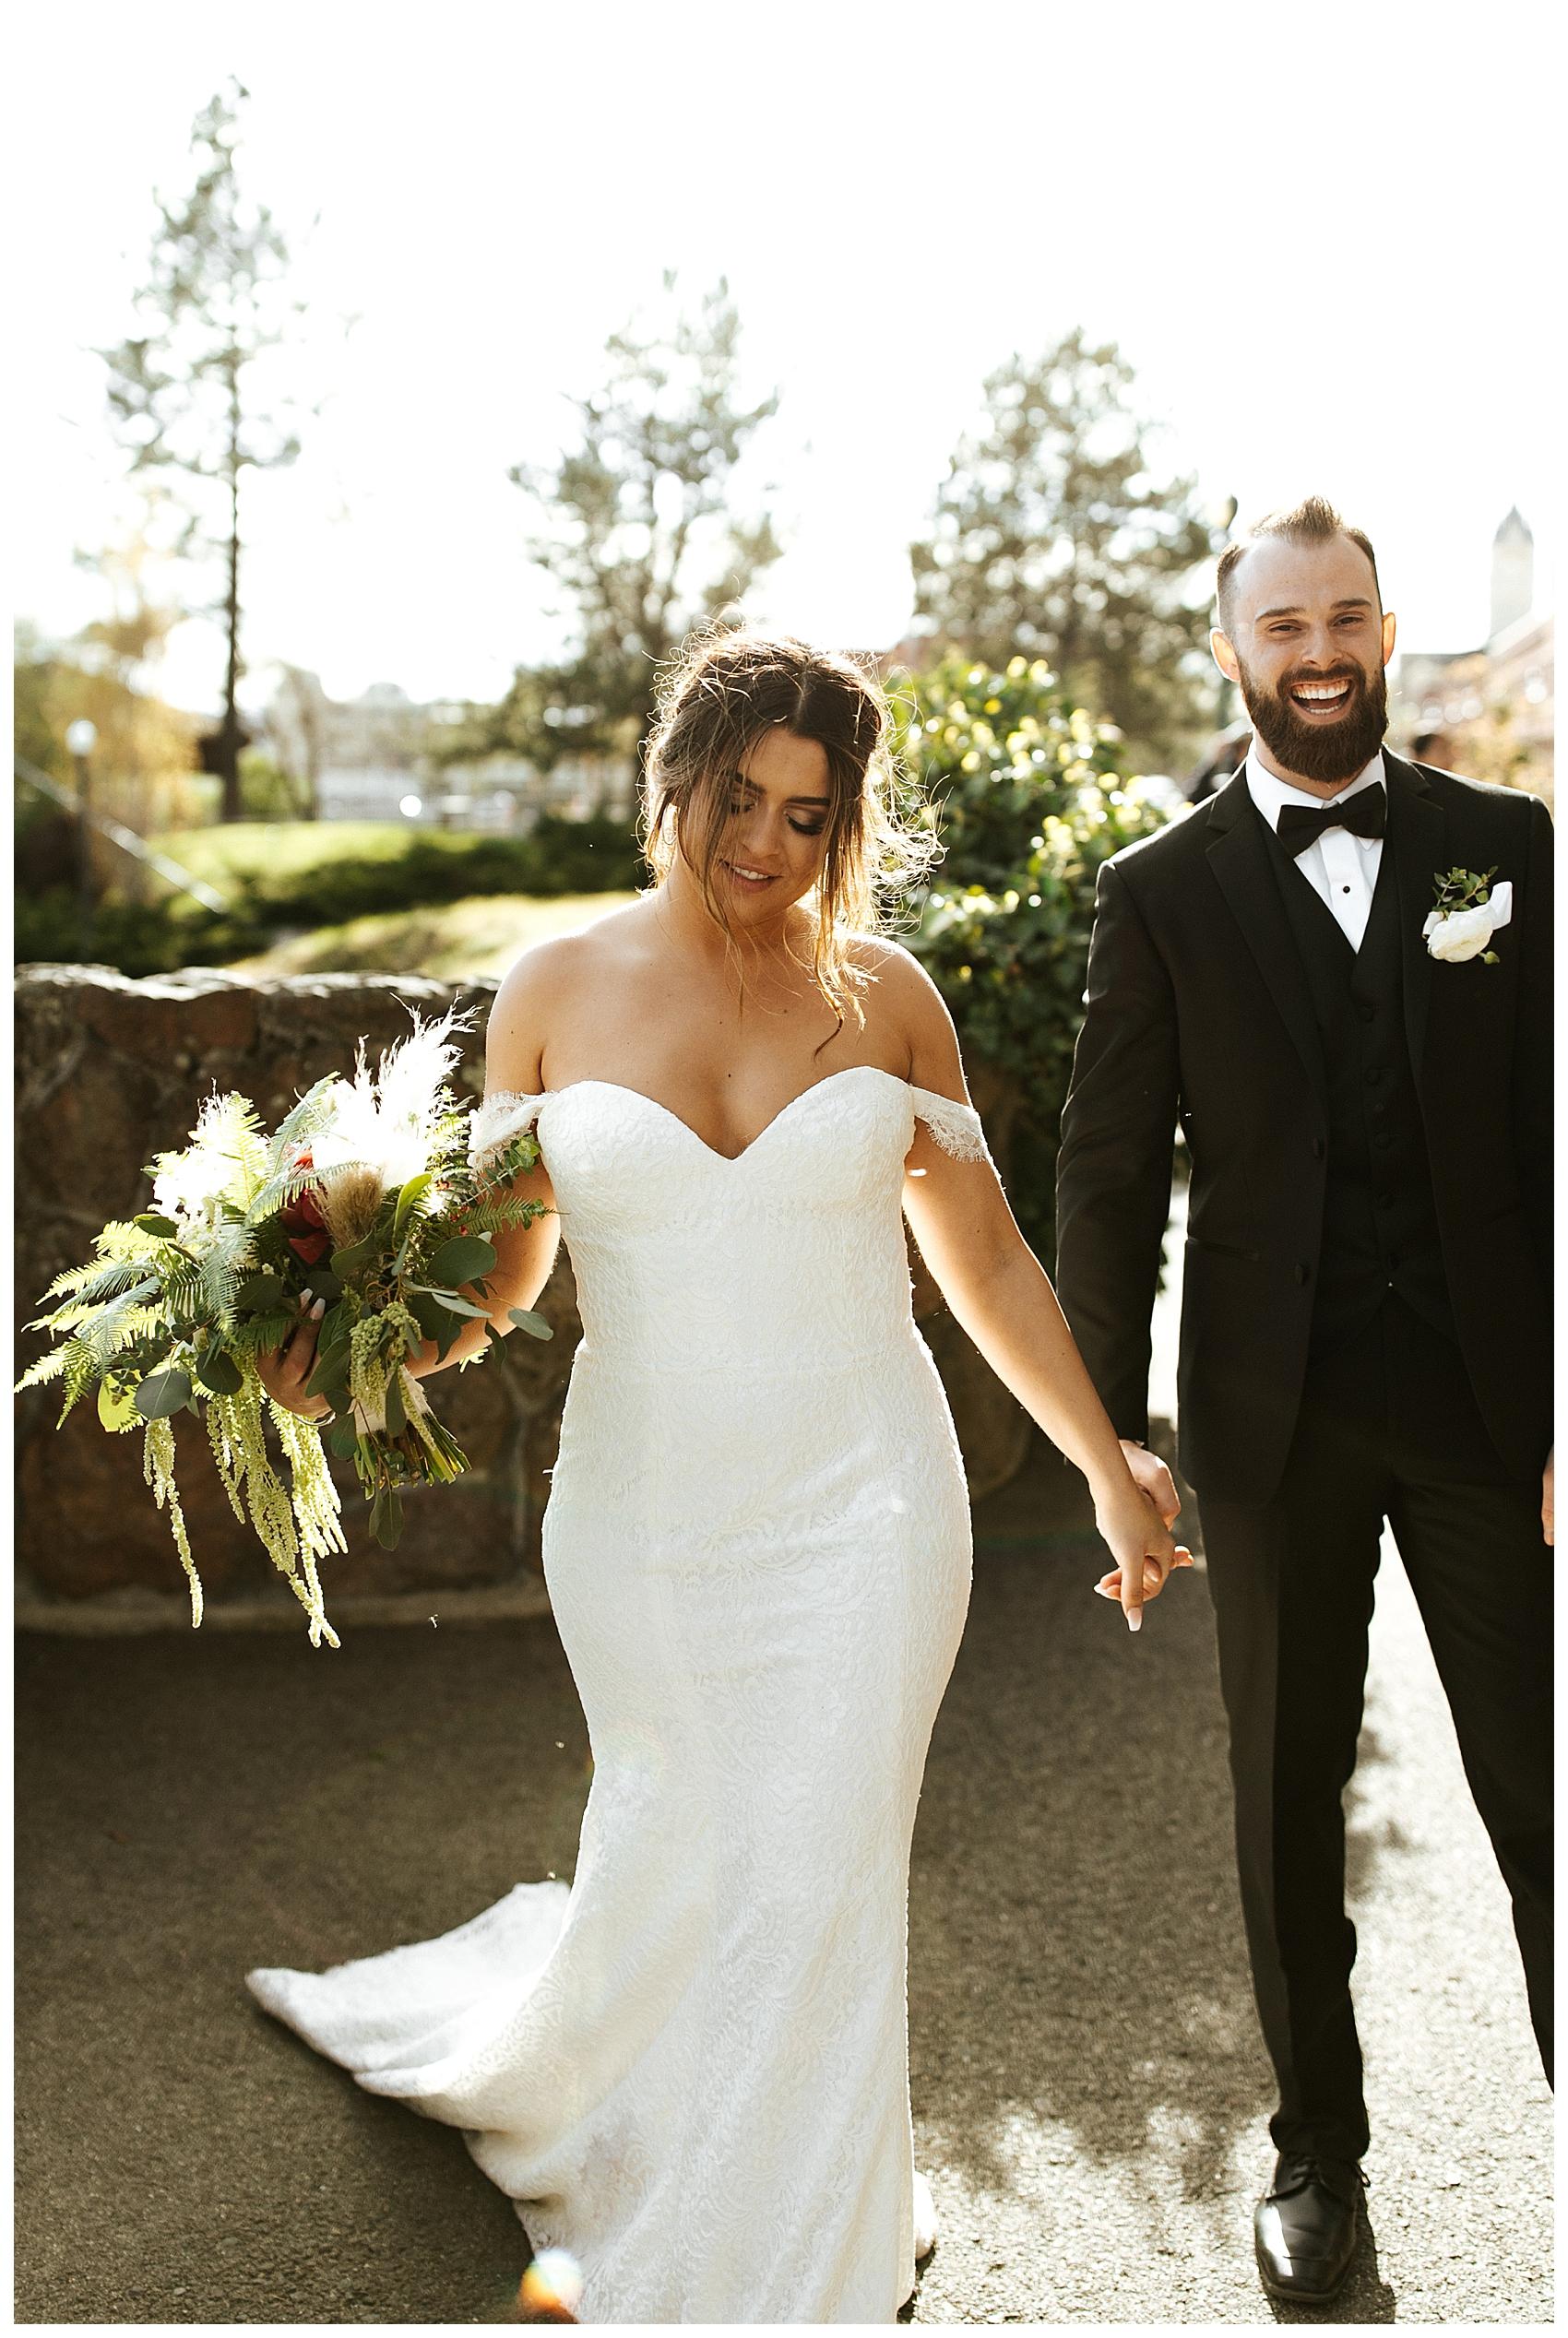 Chateau Rive Spokane Wedding Cassie Trottier Photography01096.jpg